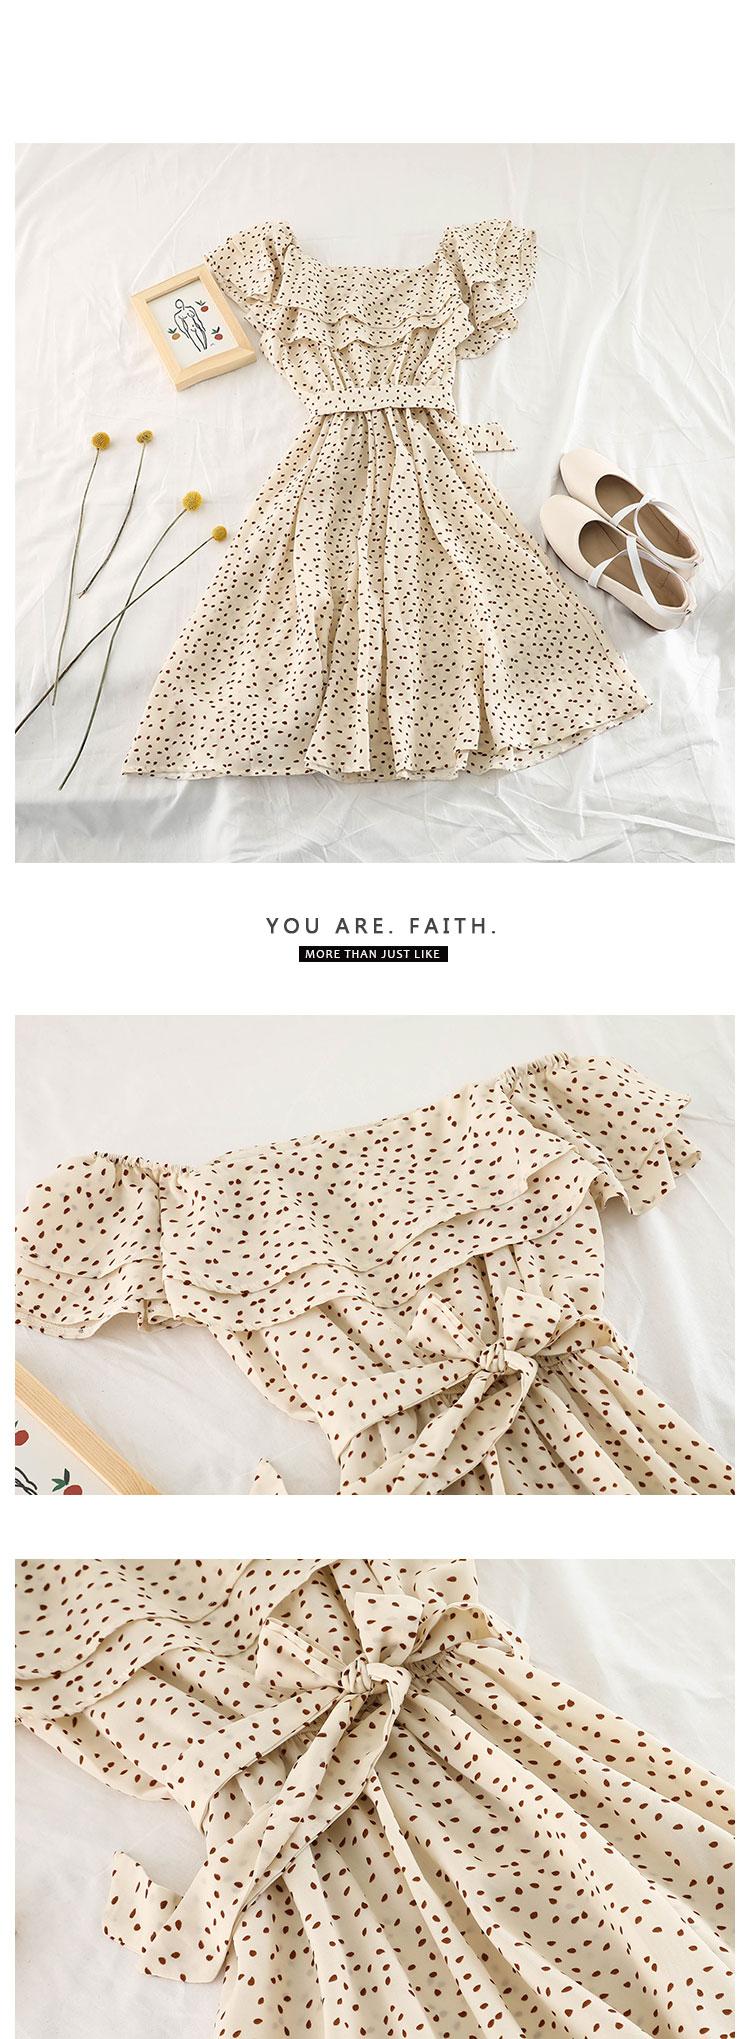 New fashion women's dresses 5